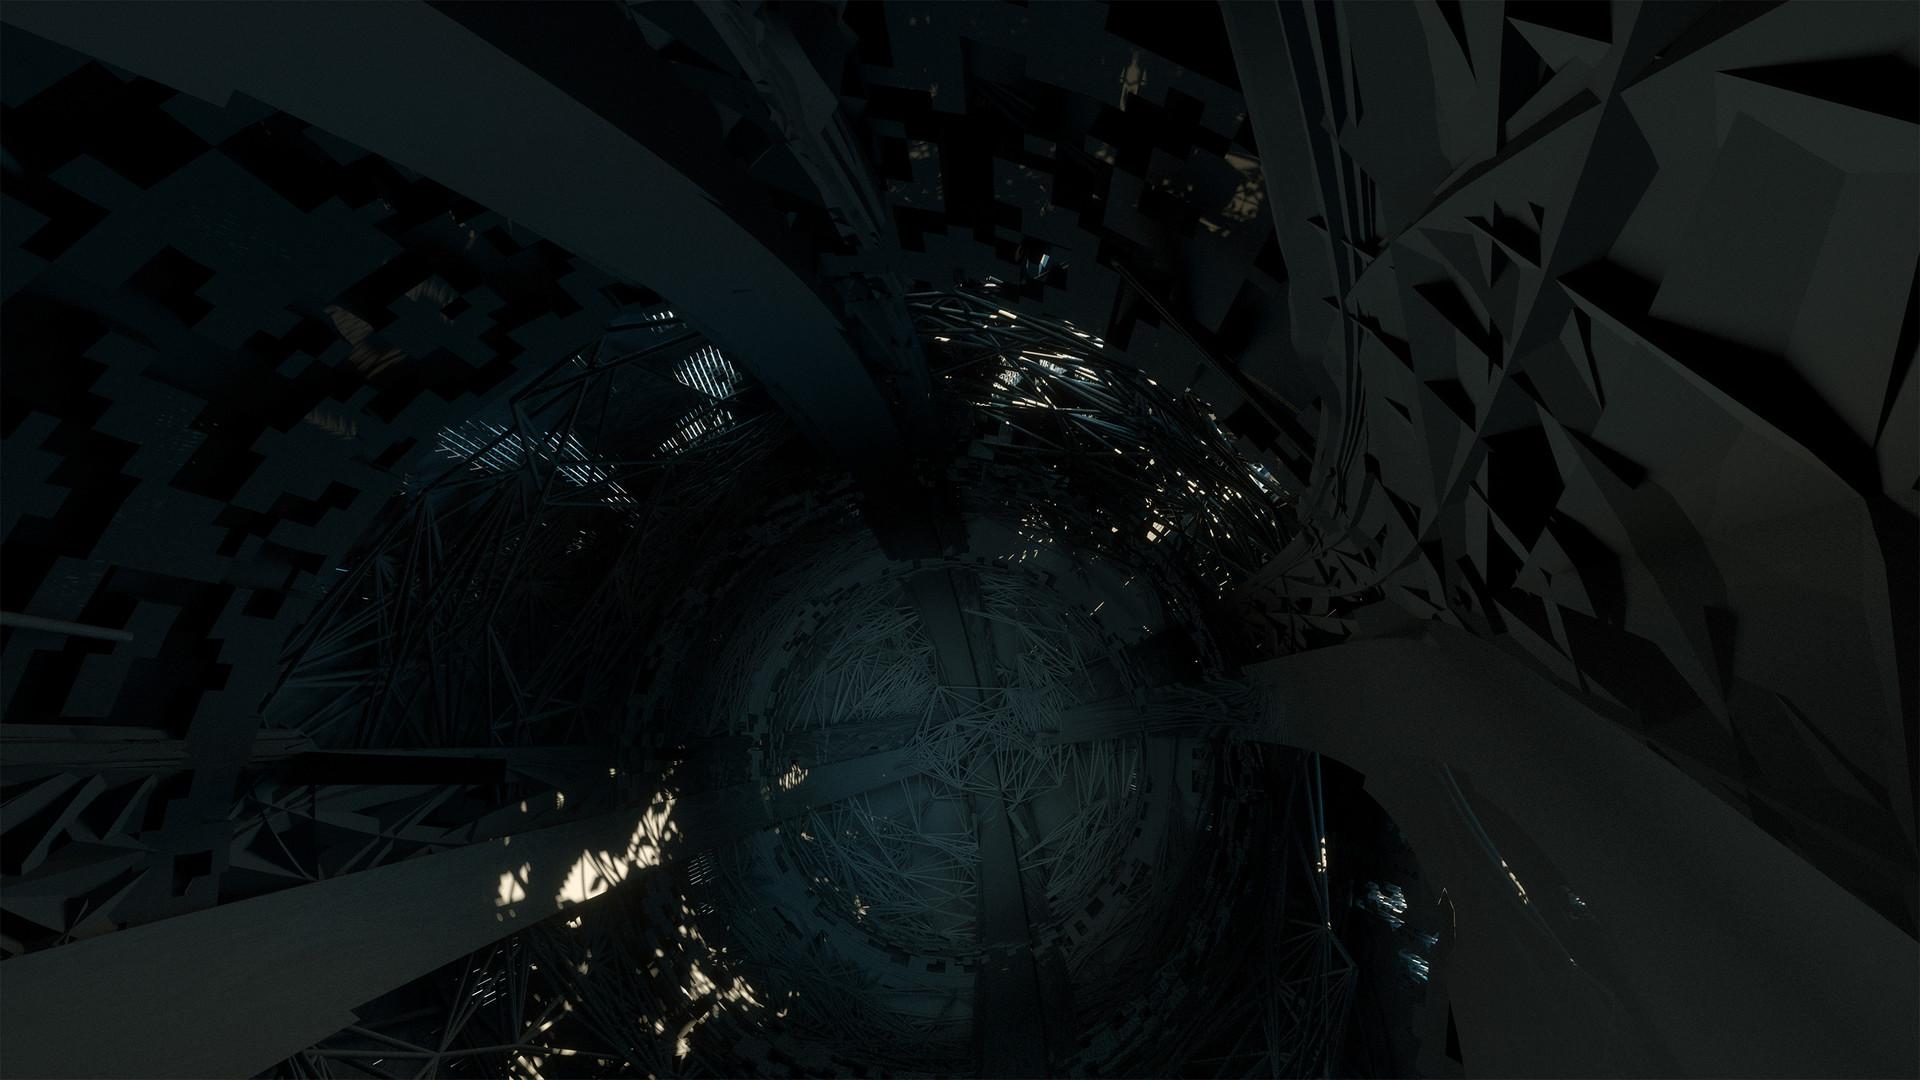 Leon tukker aerostat render1 copy